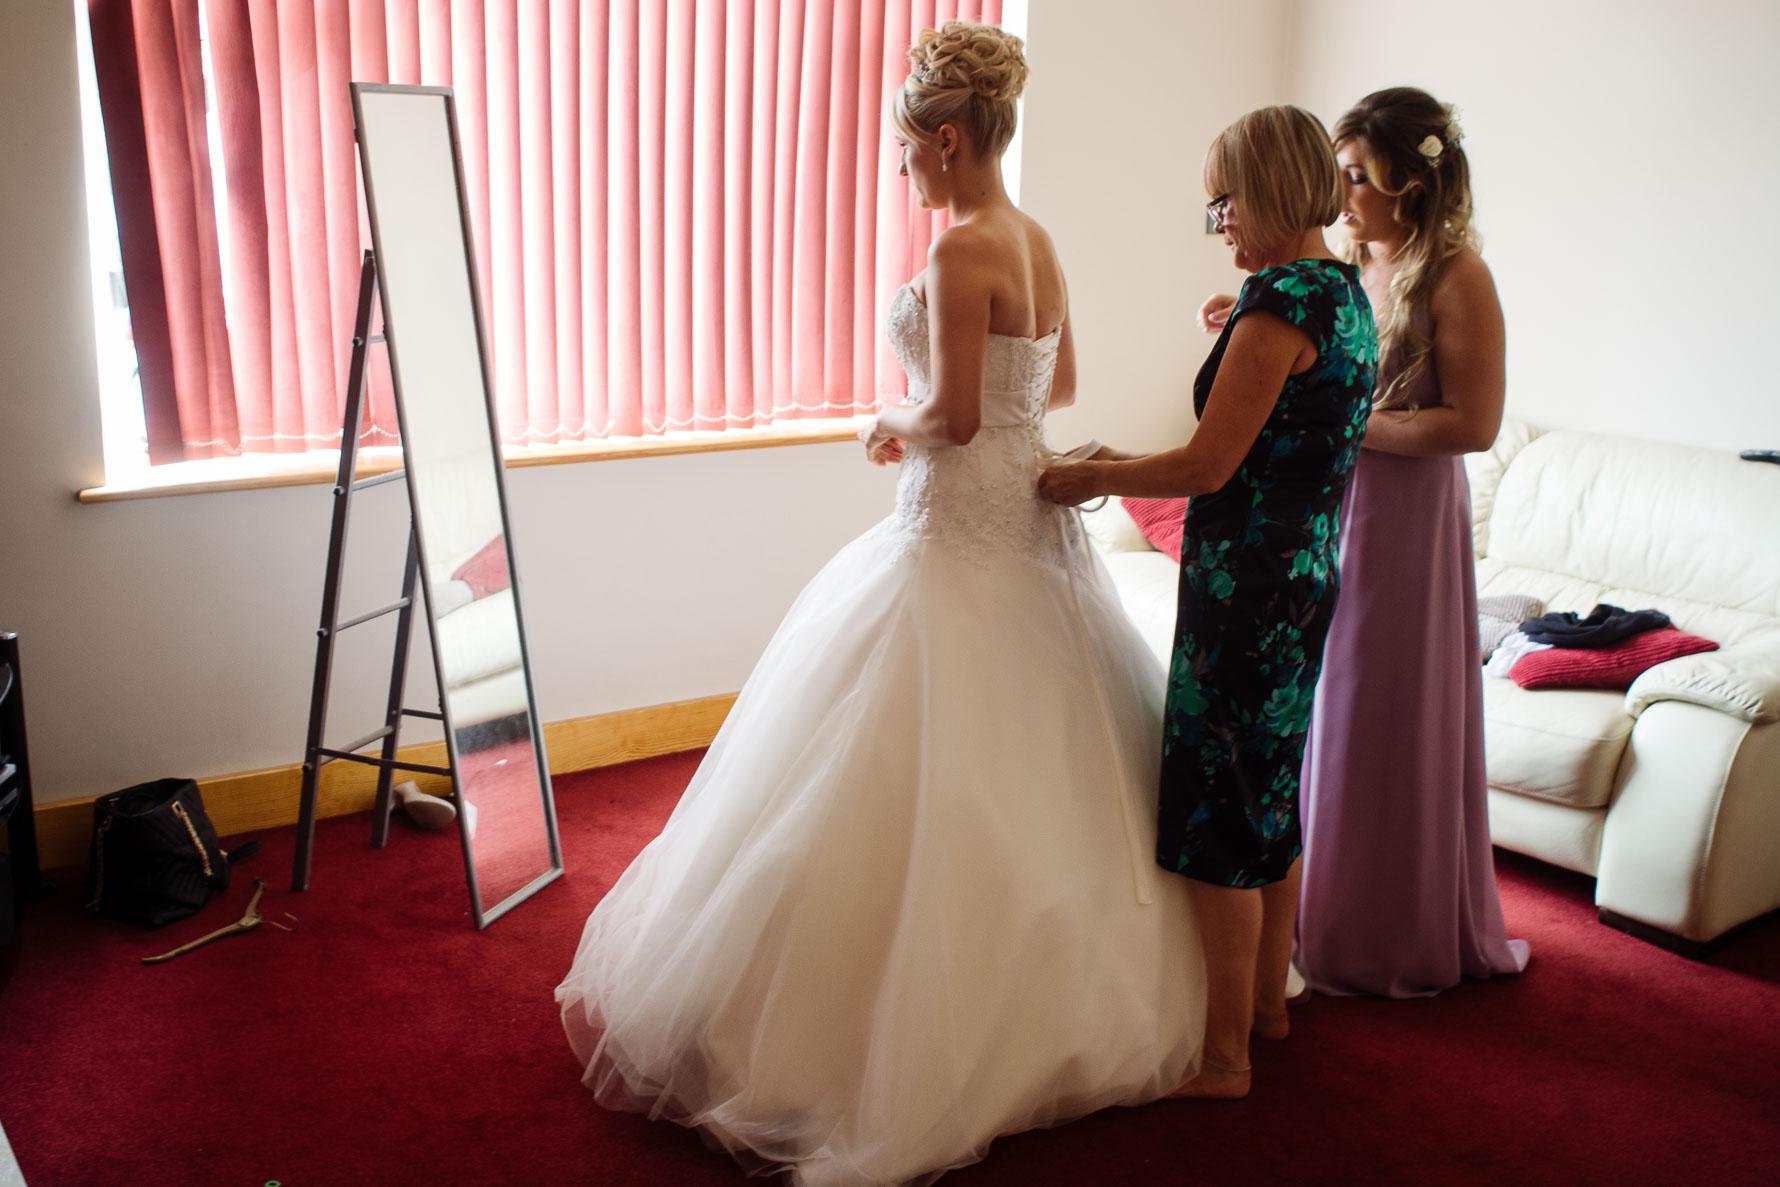 Canterbury Cathedral Lodge Wedding13-20141004 0275